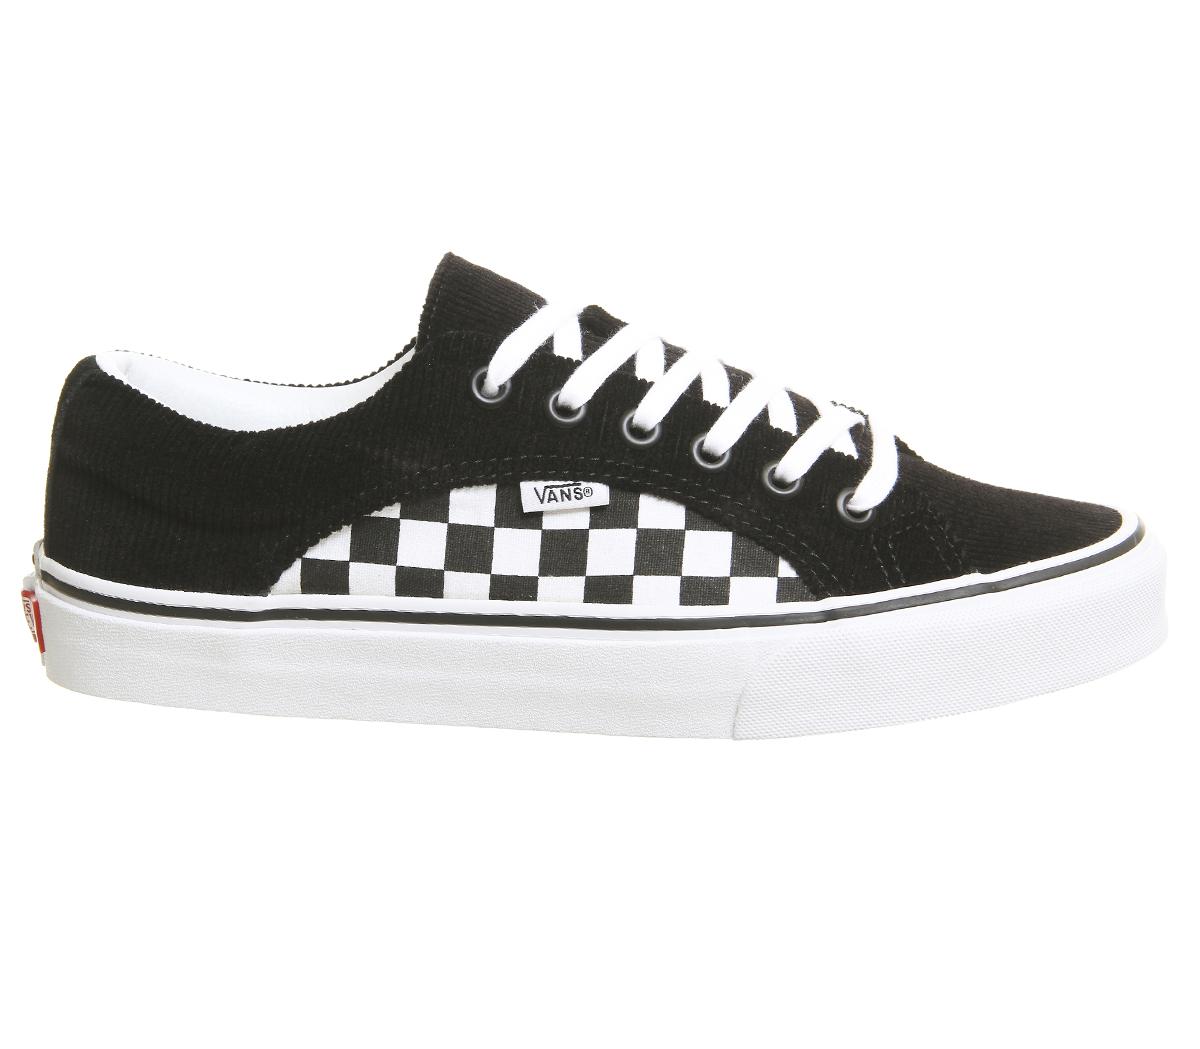 72210f5cbb Sentinel Vans Lampin Trainers Black True White Checkerboard Cord Trainers  Shoes